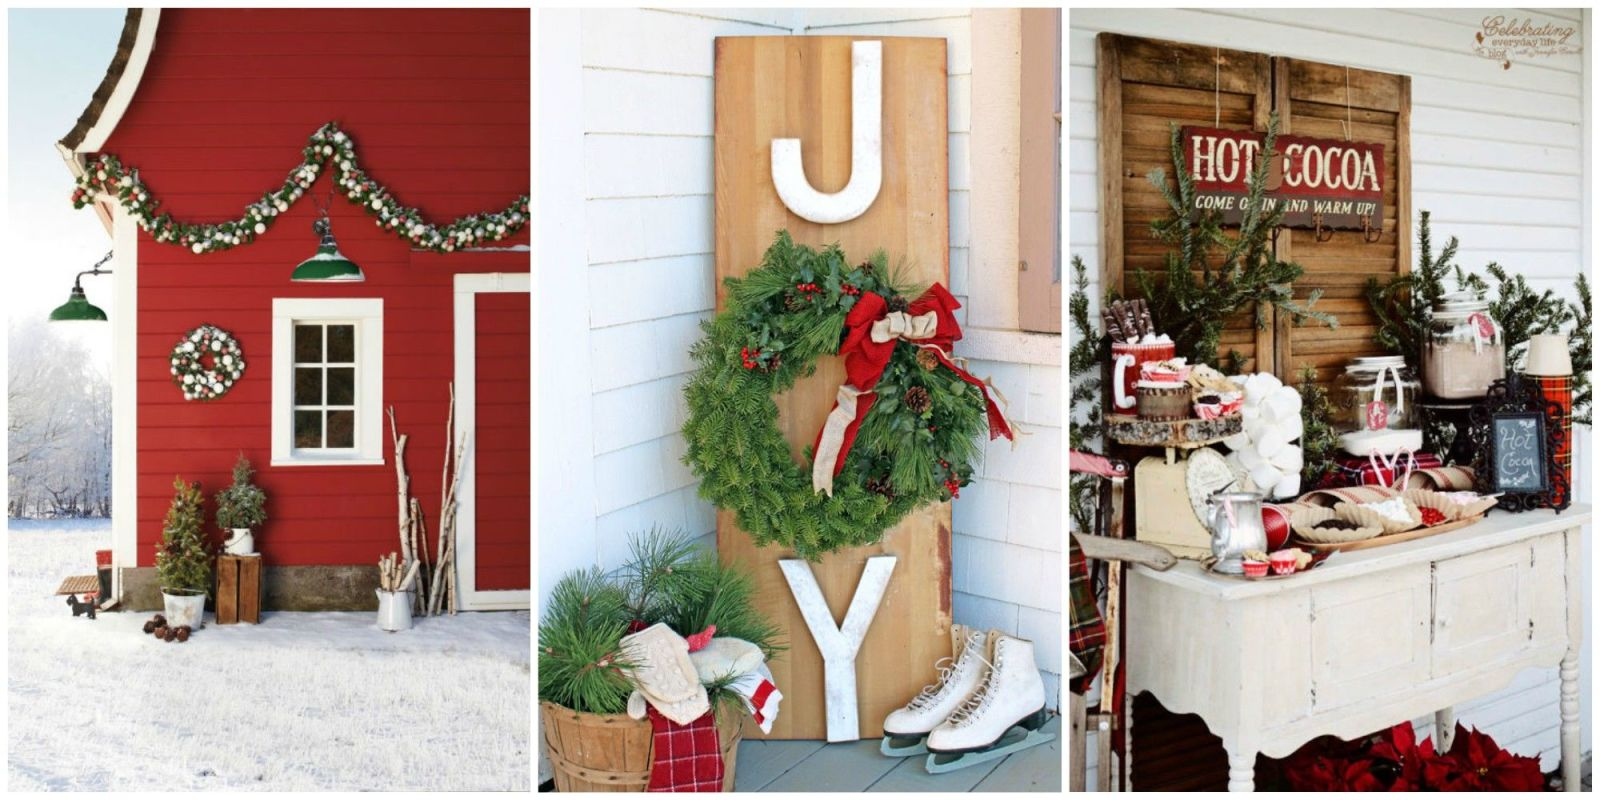 Christmas decorations outdoor porch - 34 Outdoor Christmas Decorations Ideas For Outside Christmas Porch Decor